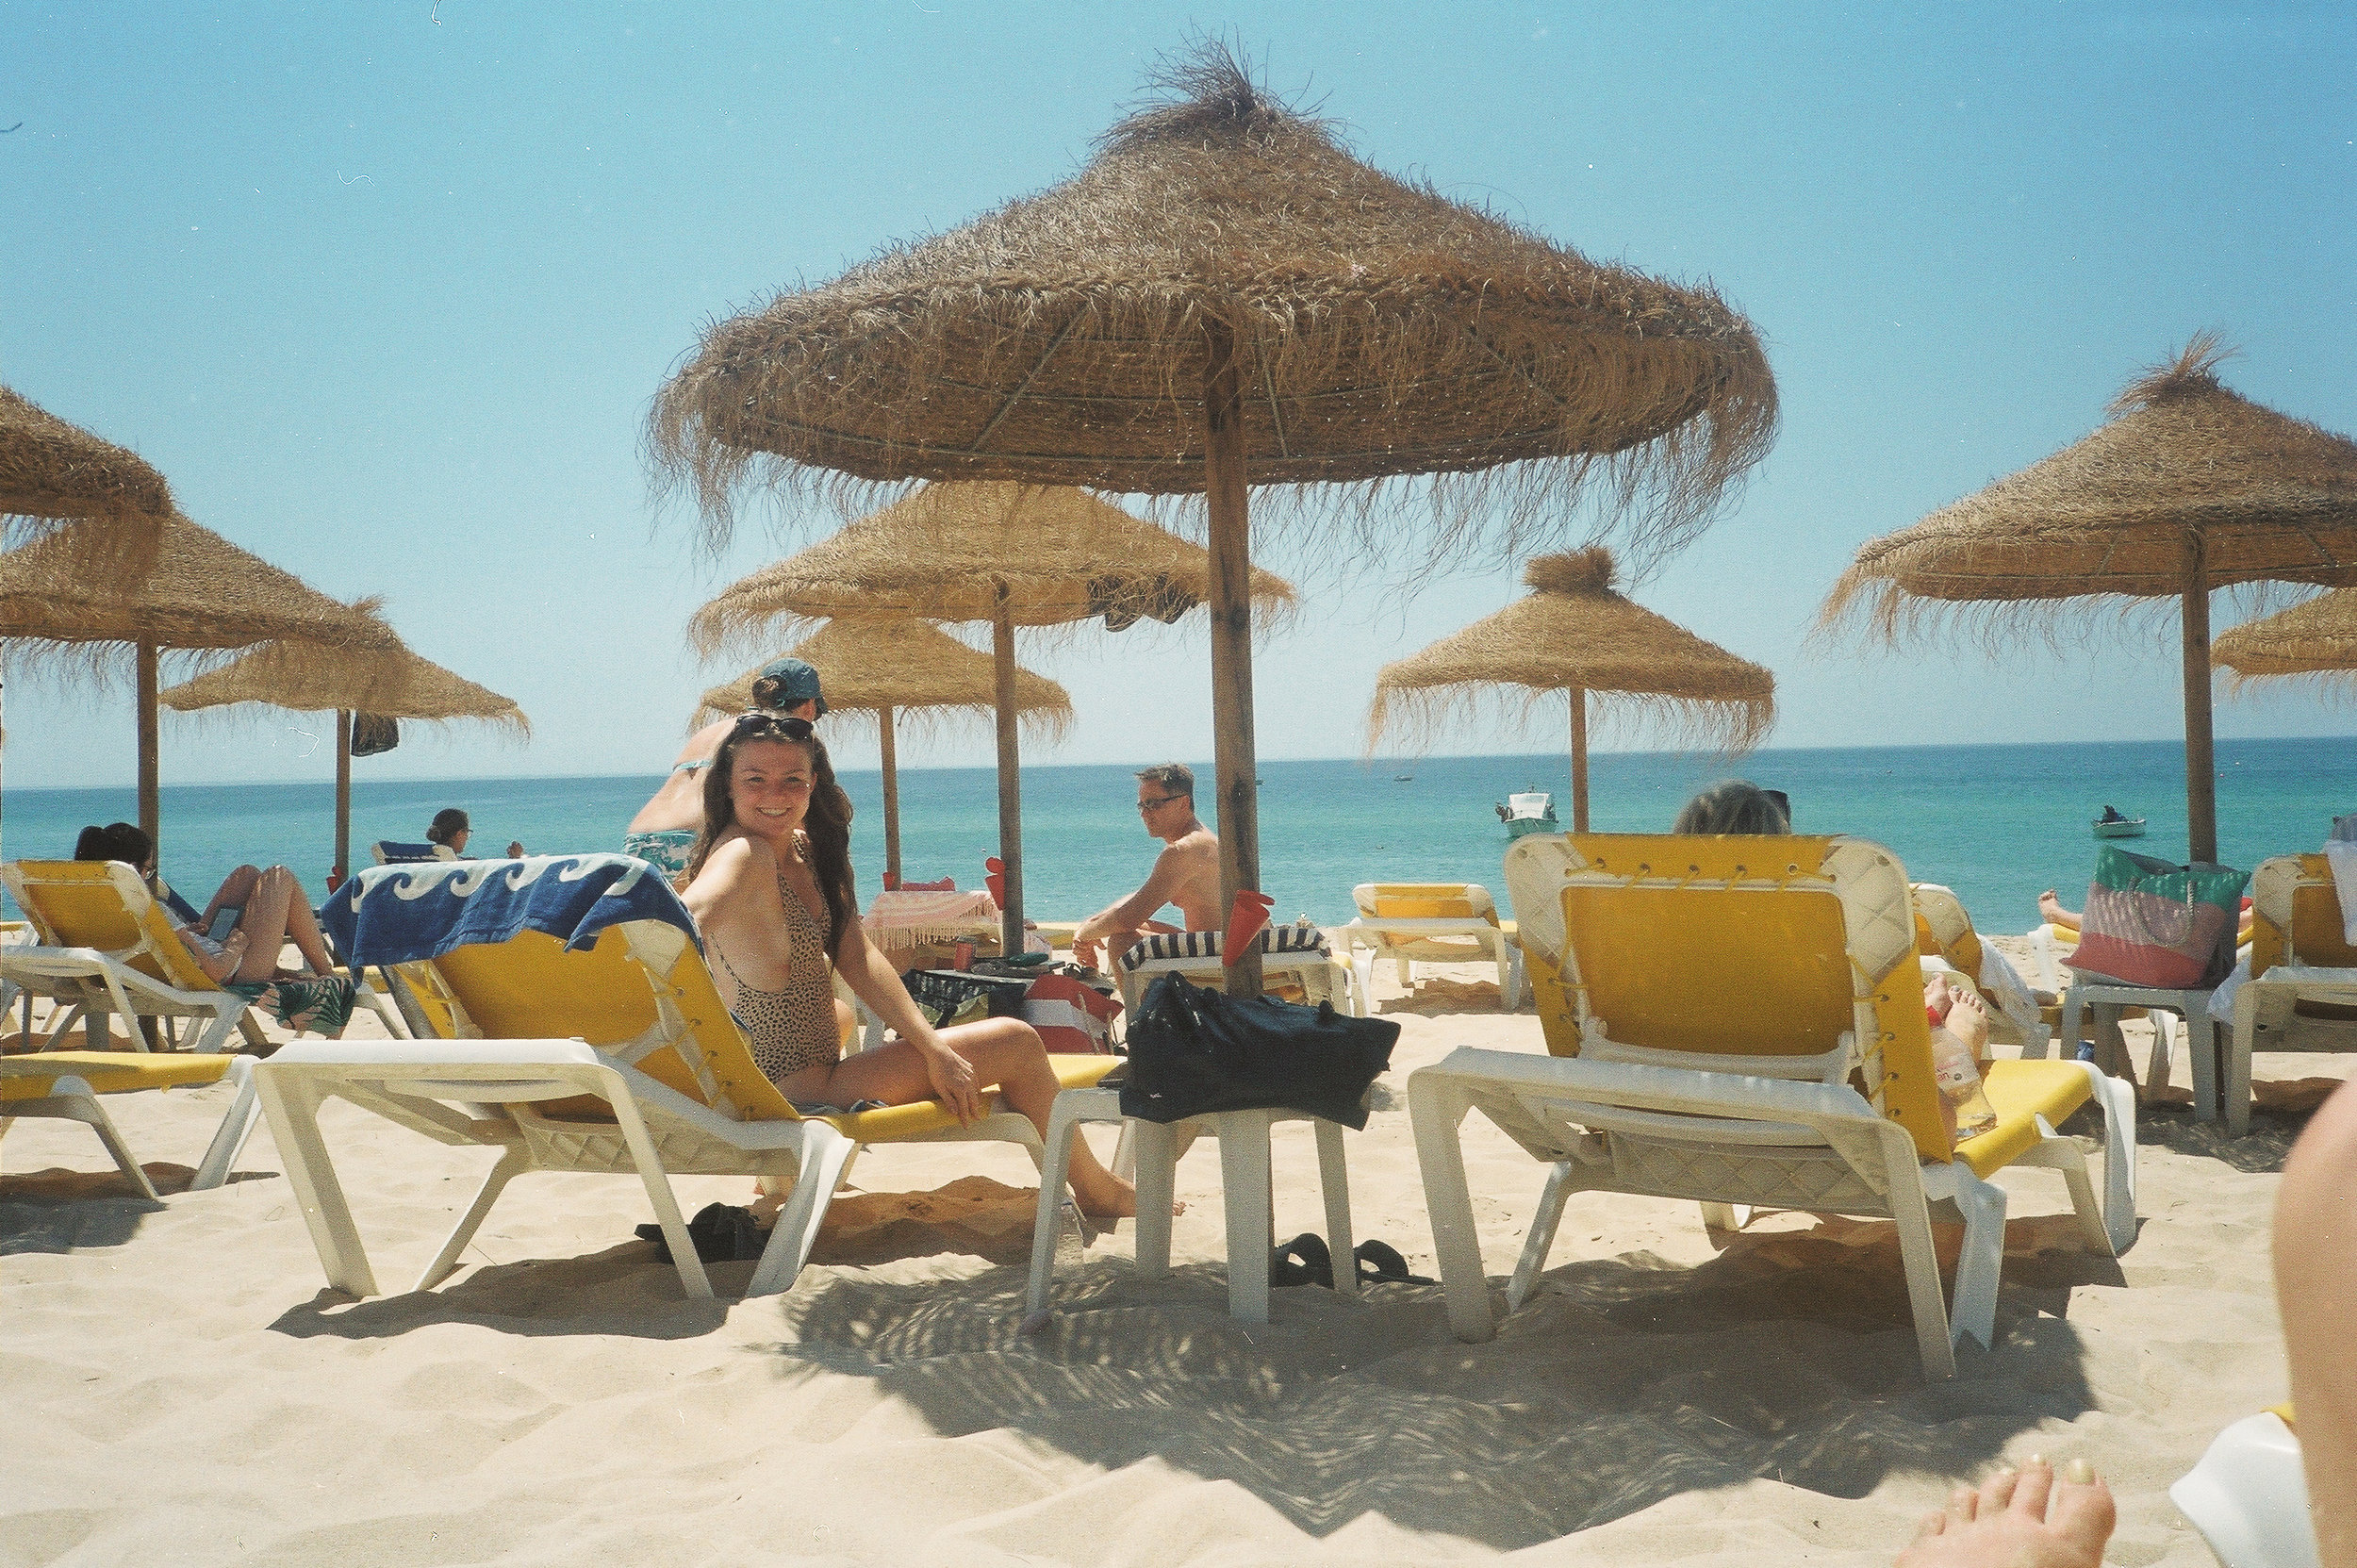 a-girls-trip-to-portugal-on-35mm-film41.jpg